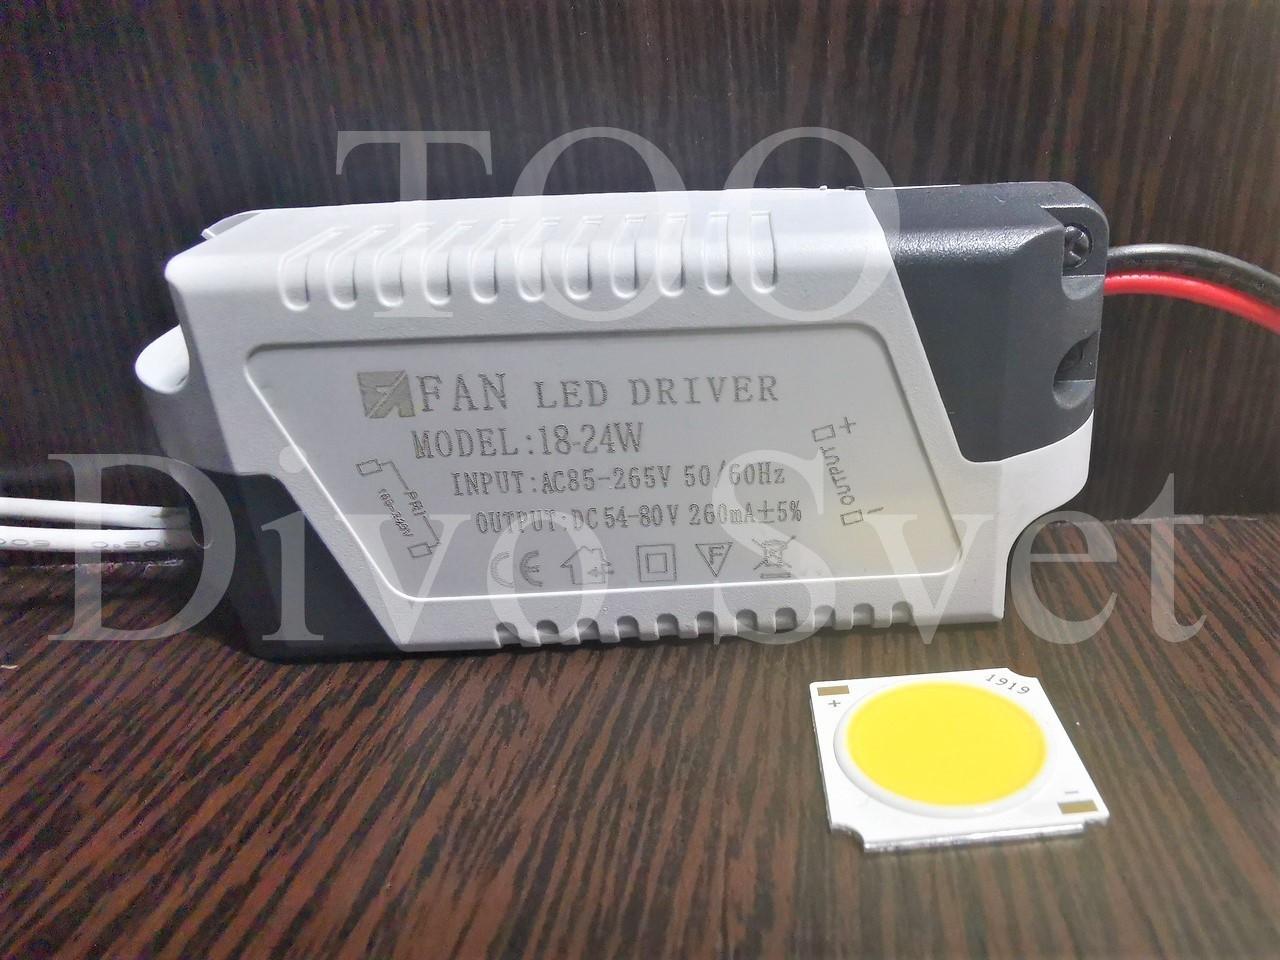 LED матрица 24 Ватт 4000-4200К, 6000К + LED драйвер 18-24 Ватт для трековых светильников